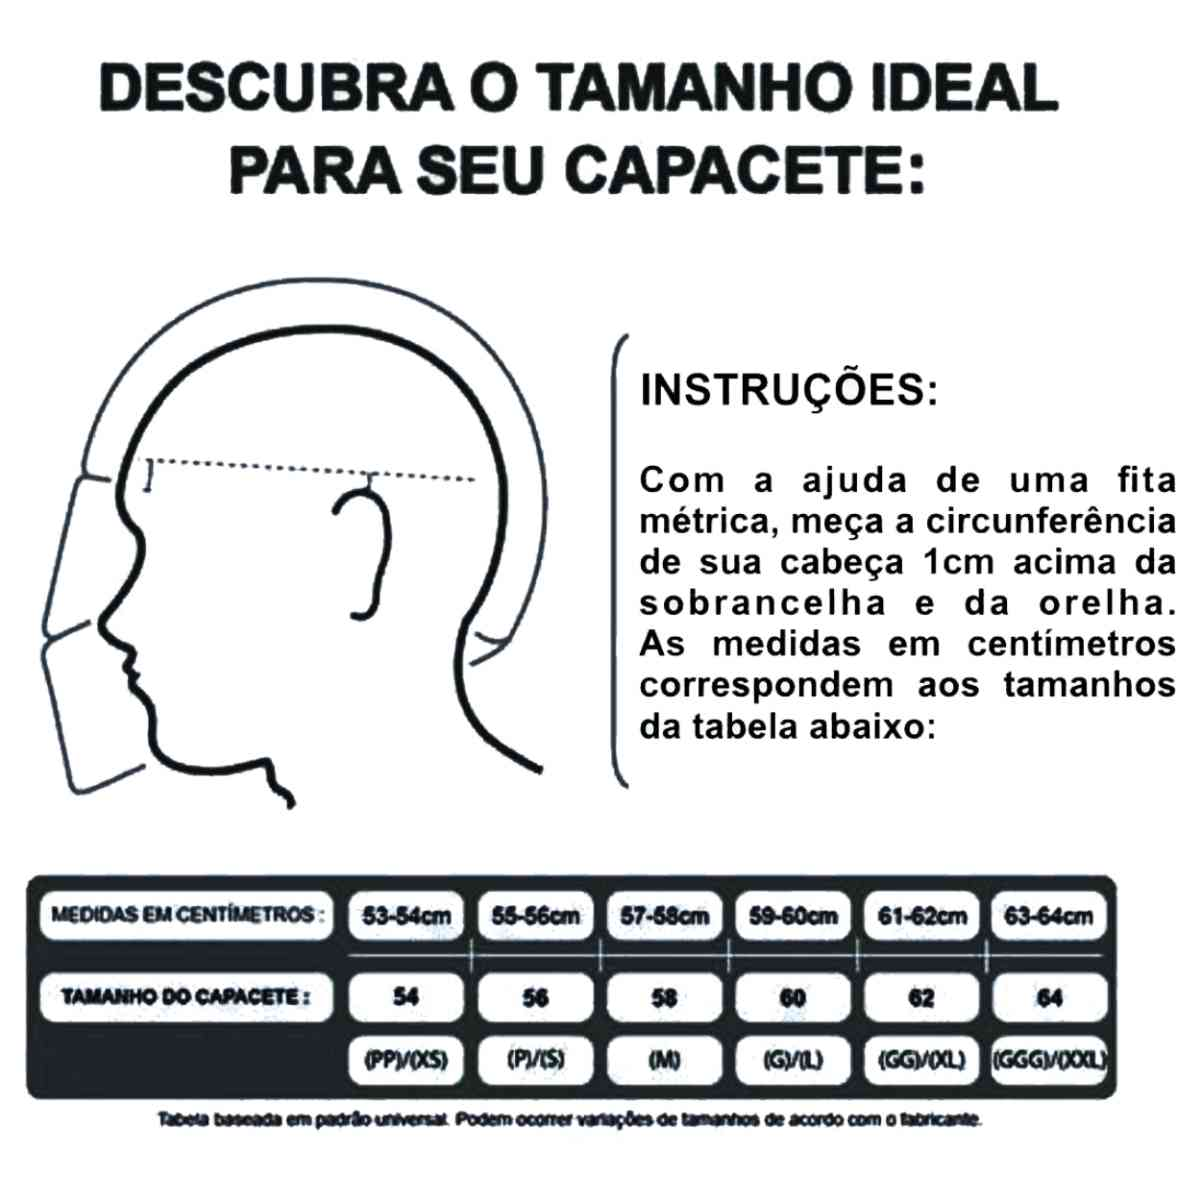 CAPACETE ABERTO KRAFT REVESTIDO COURO SINTÉTICO RETRÔ VINTAGE COM VISEIRA + BALACLAVA TOUCA NINJA